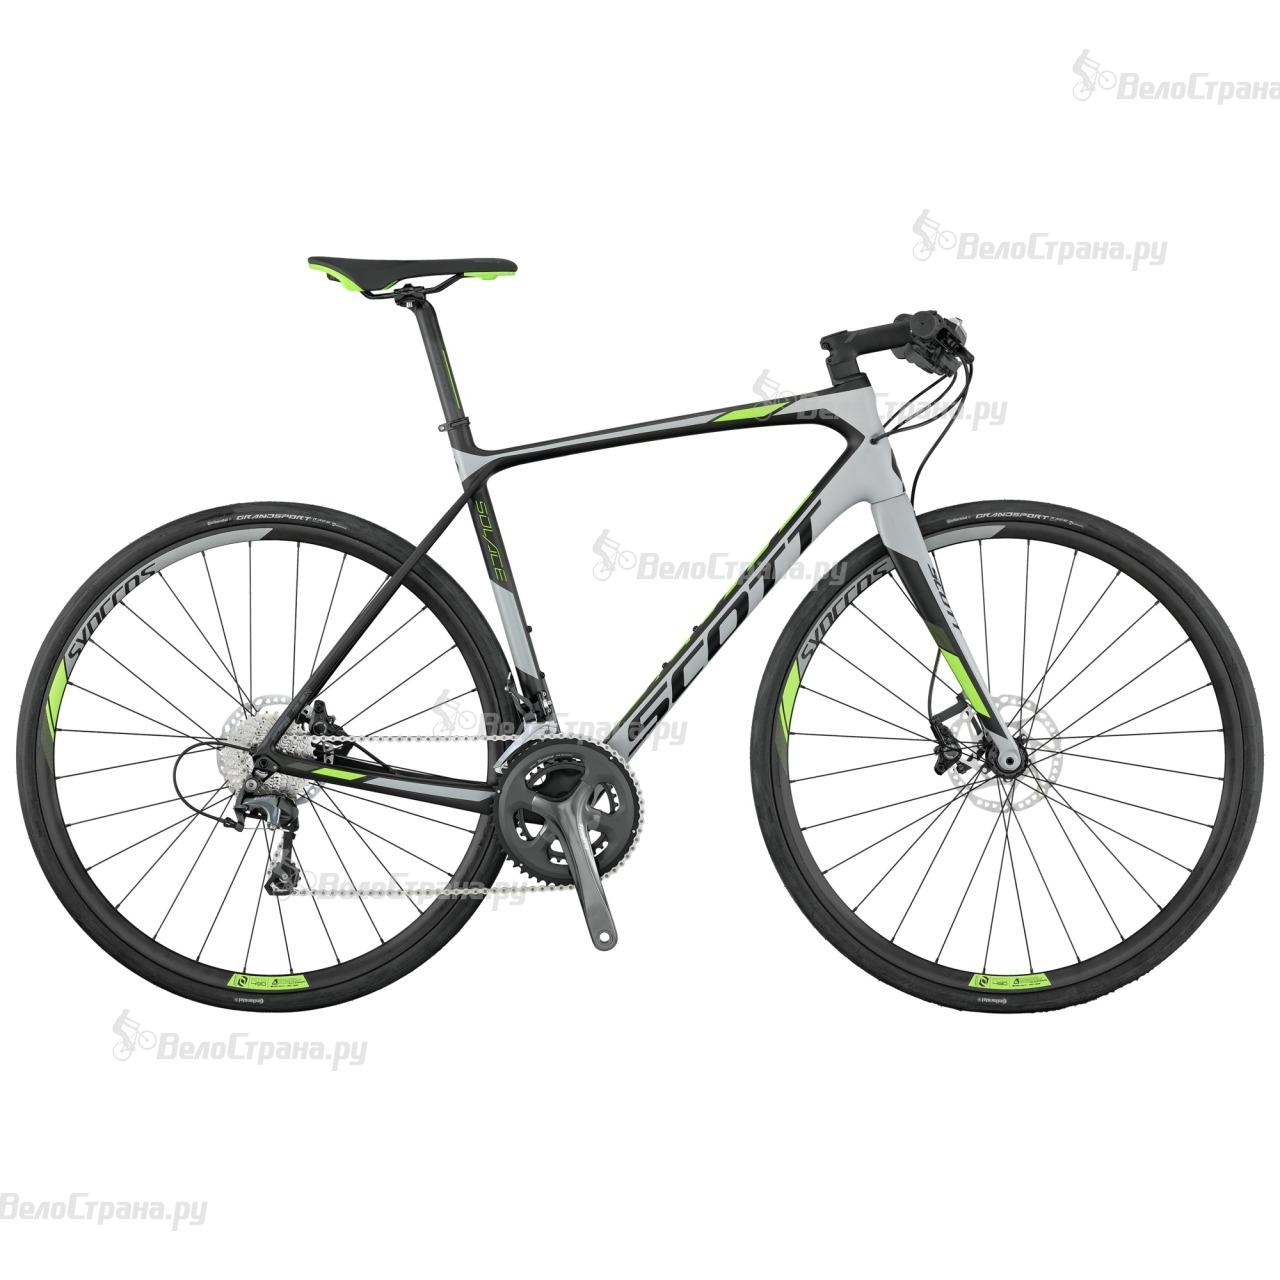 Велосипед Scott Solace 30 FB Disc (2017) велосипед scott contessa solace 15 compact 2015